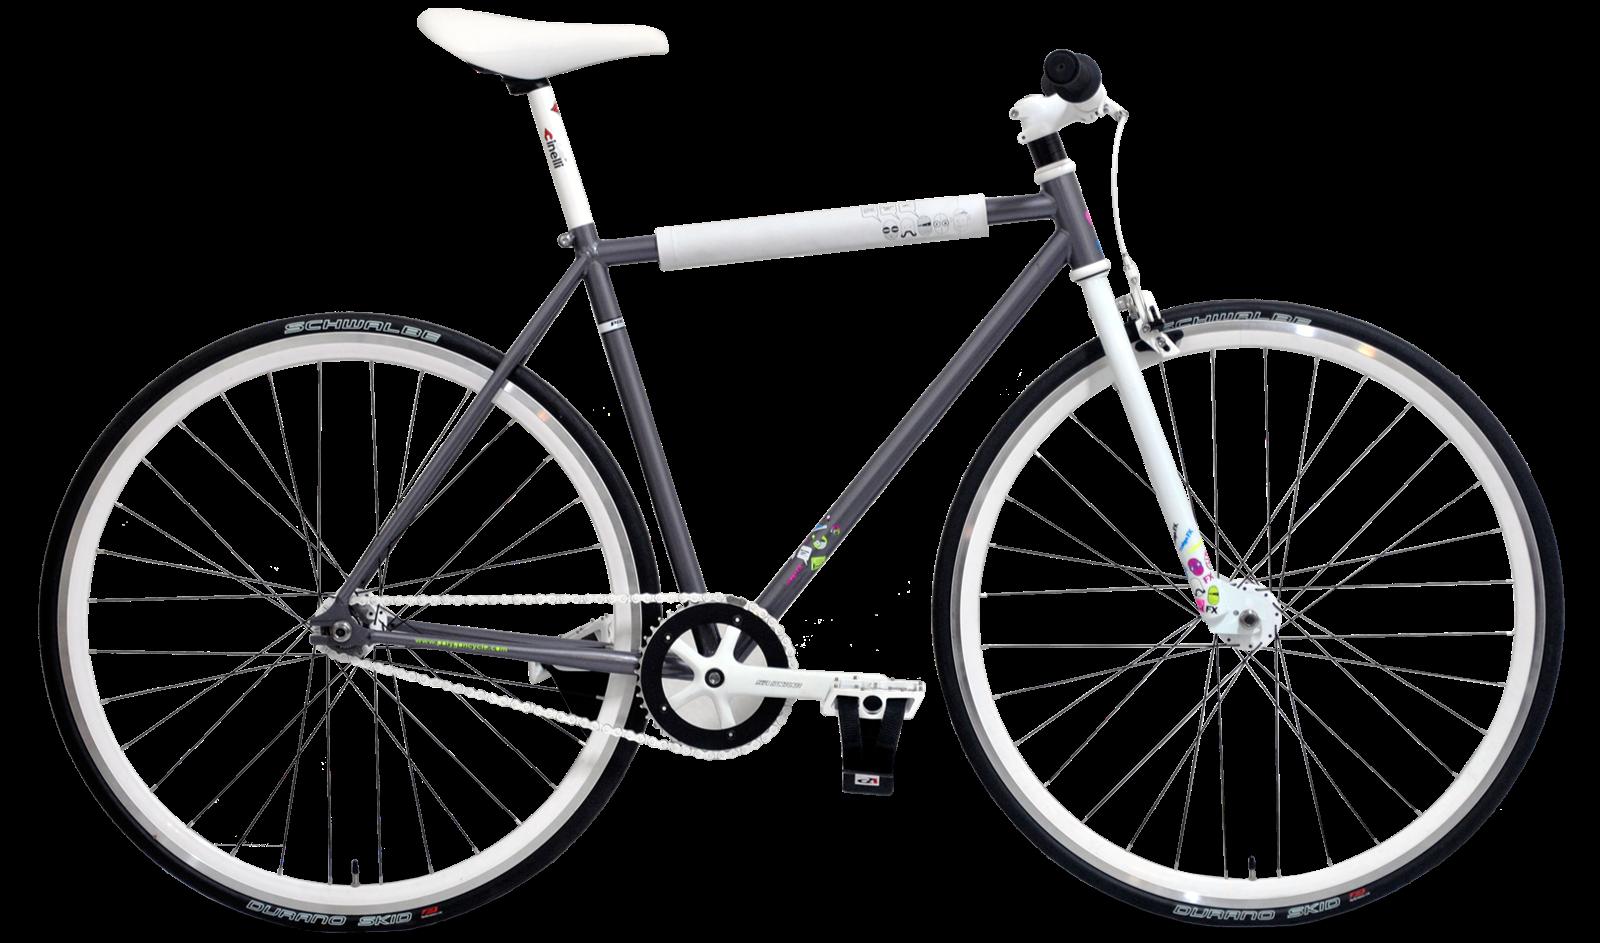 Fia Bike Sepeda Balap Polygon Rudge Fx Series